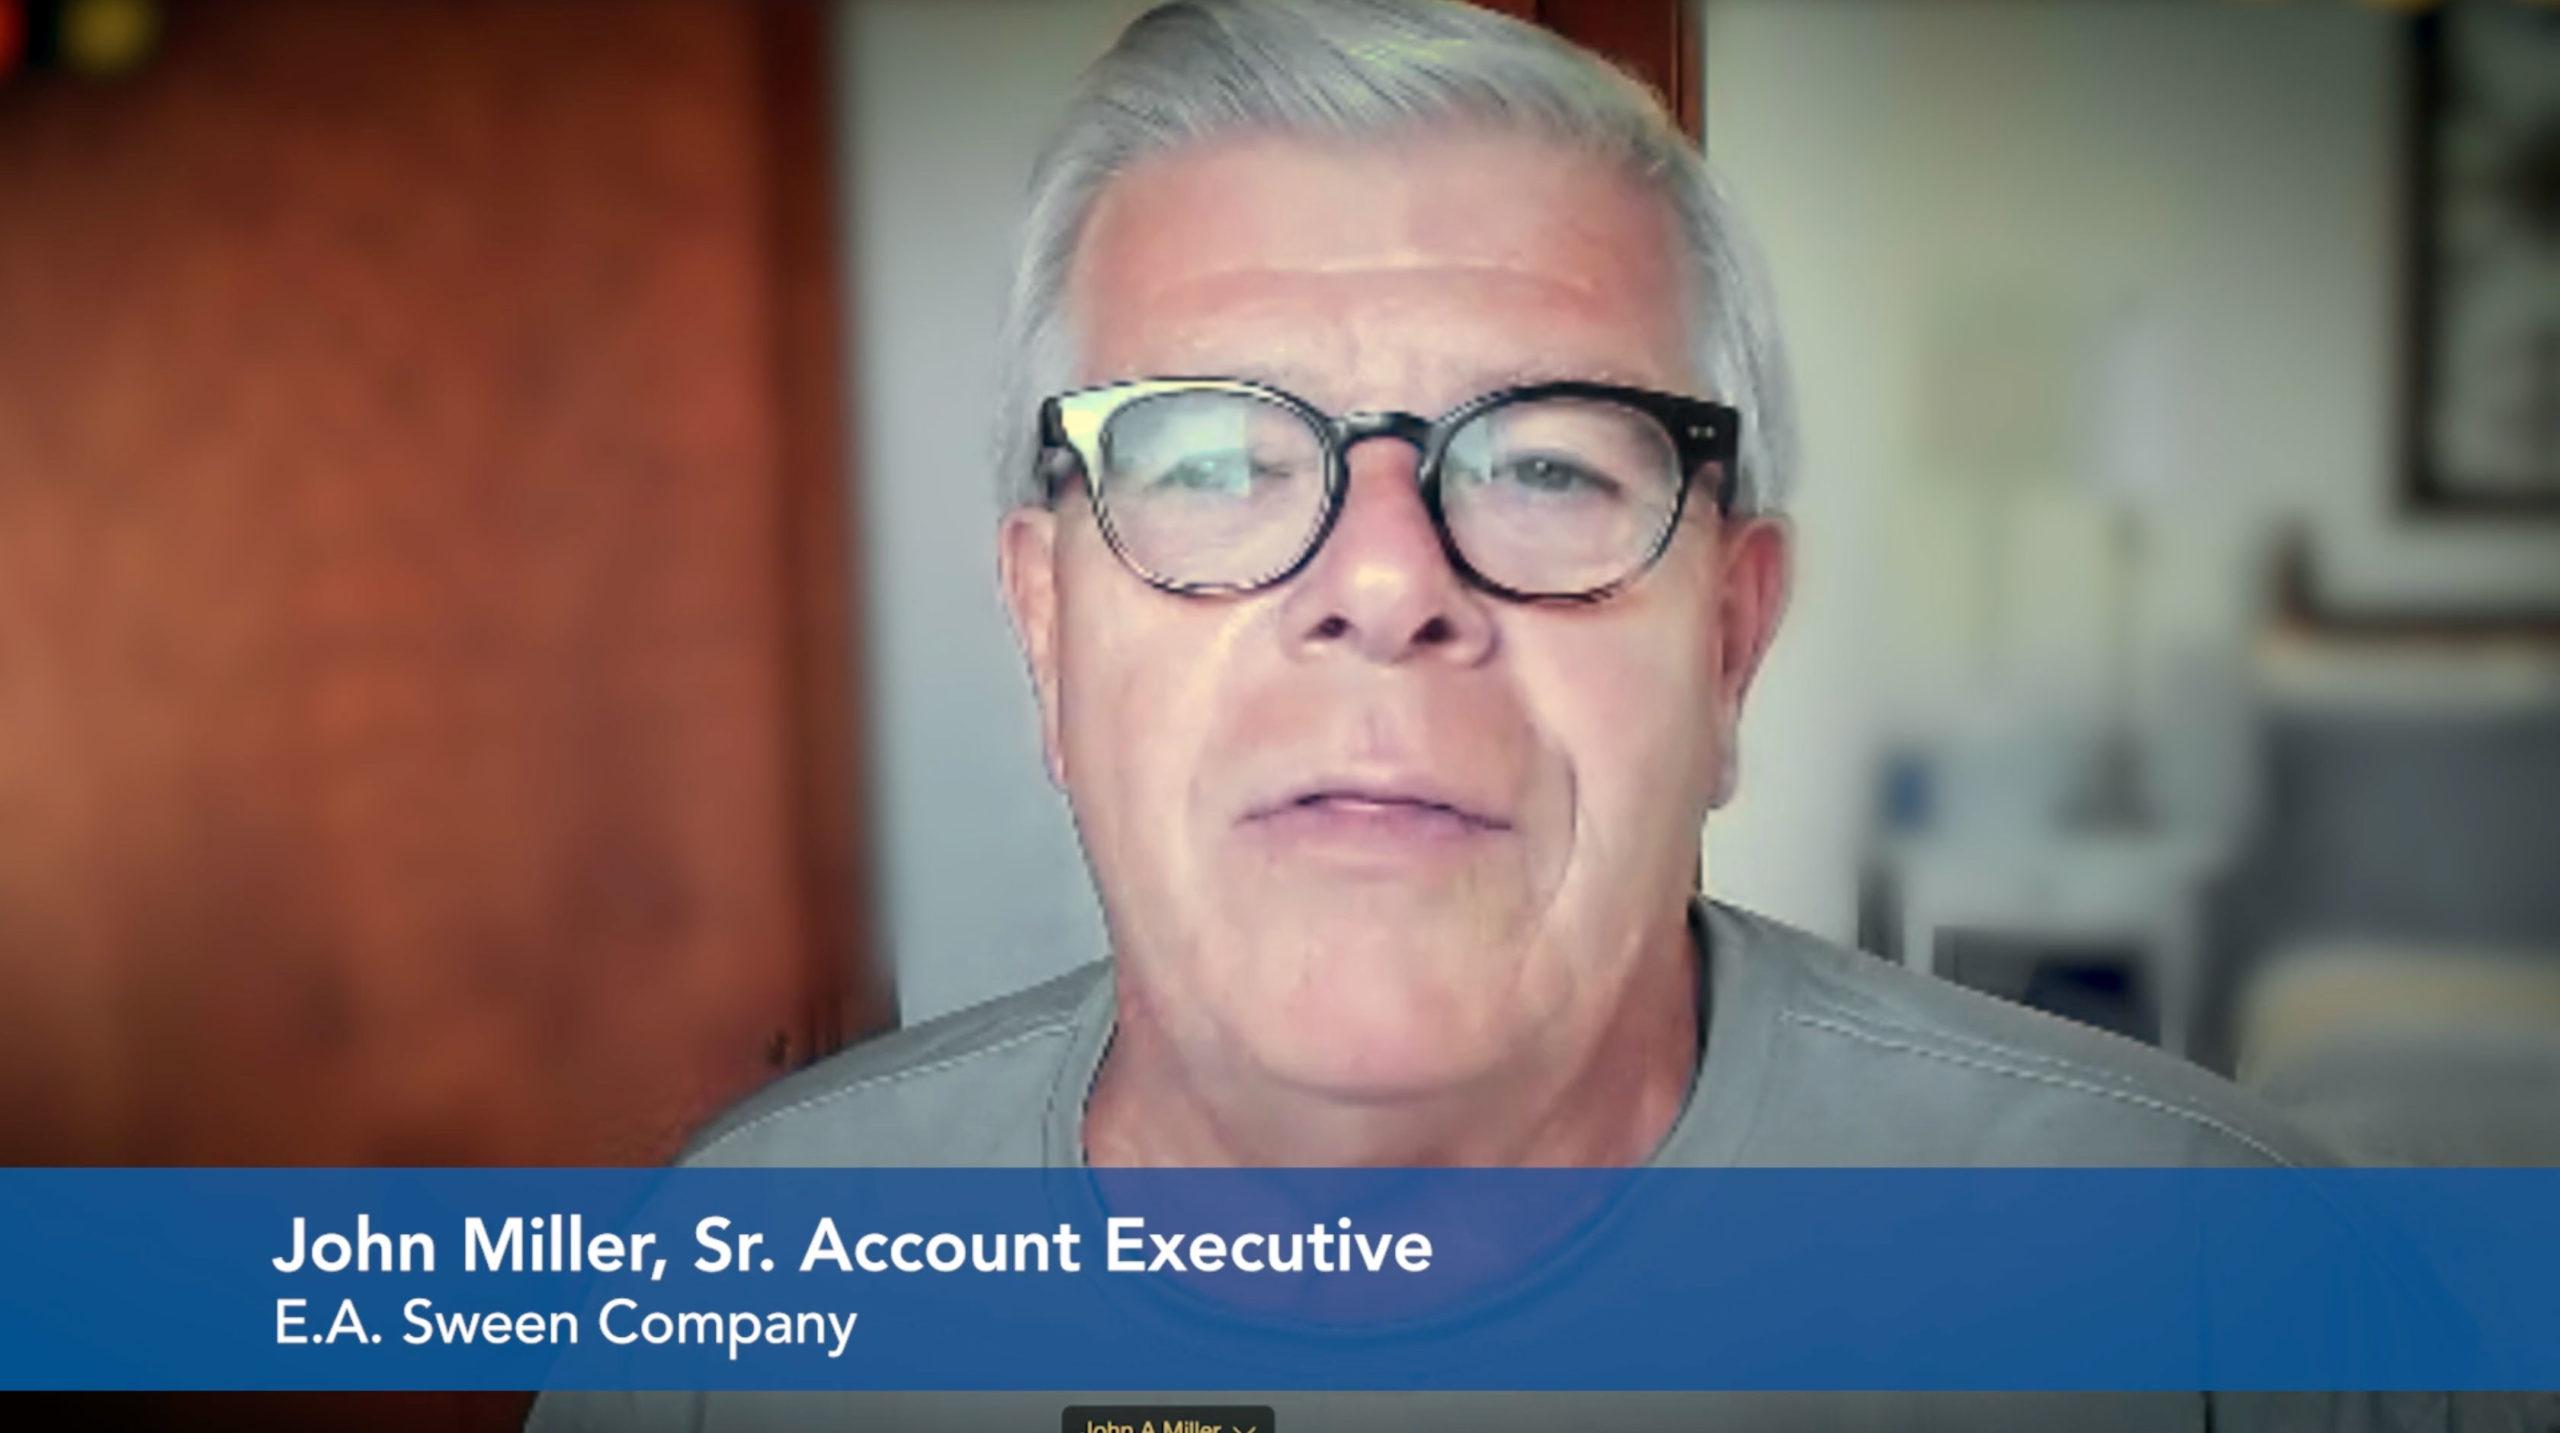 John Miller Sr. Account Executive Employee Interview